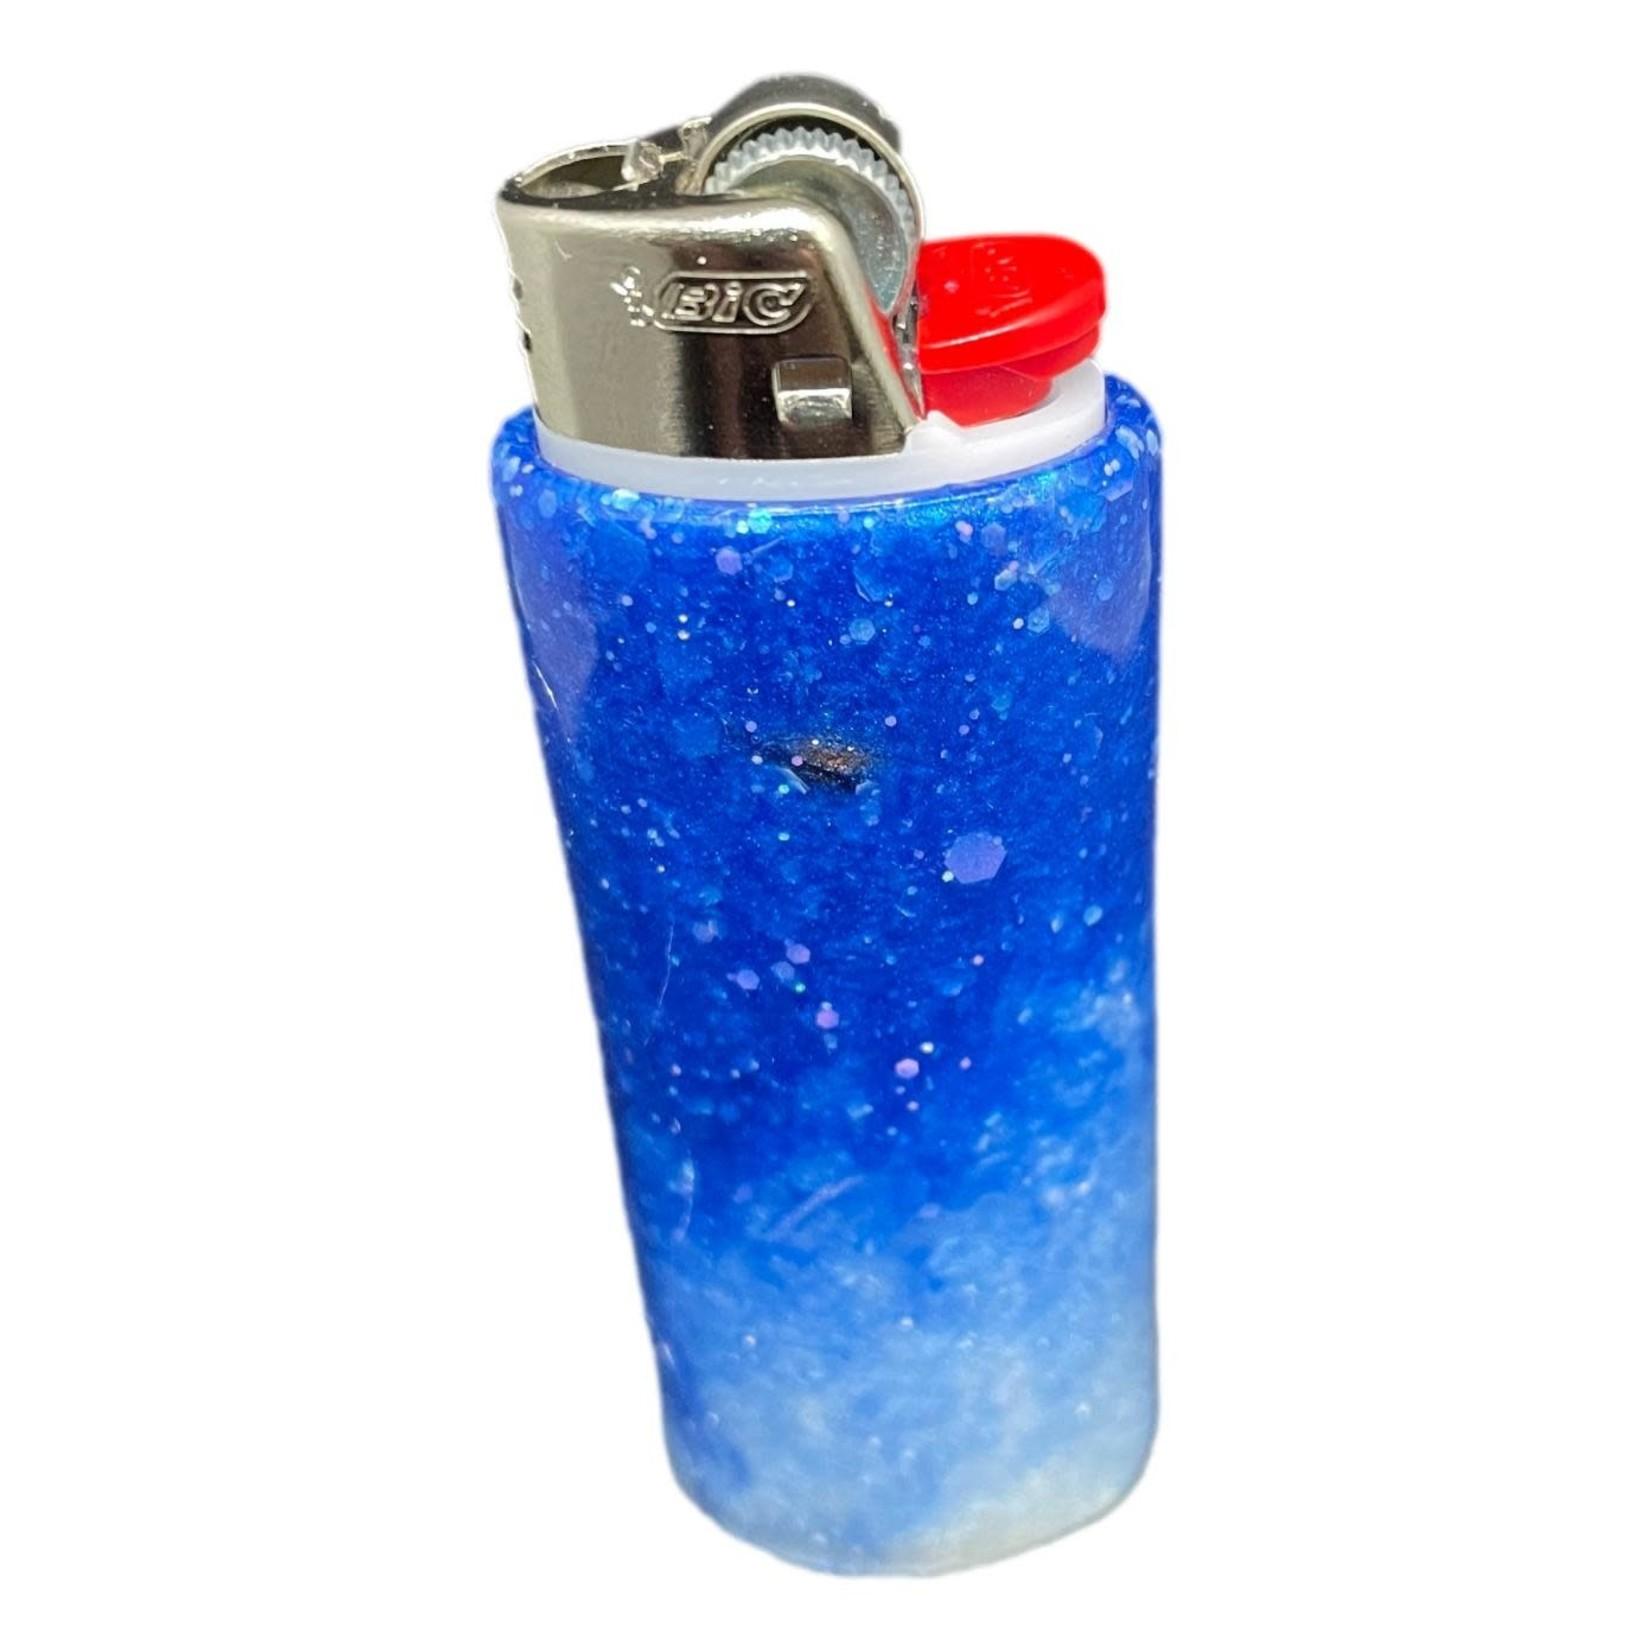 East Coast Sirens Blue & White Lighter Case (Small)